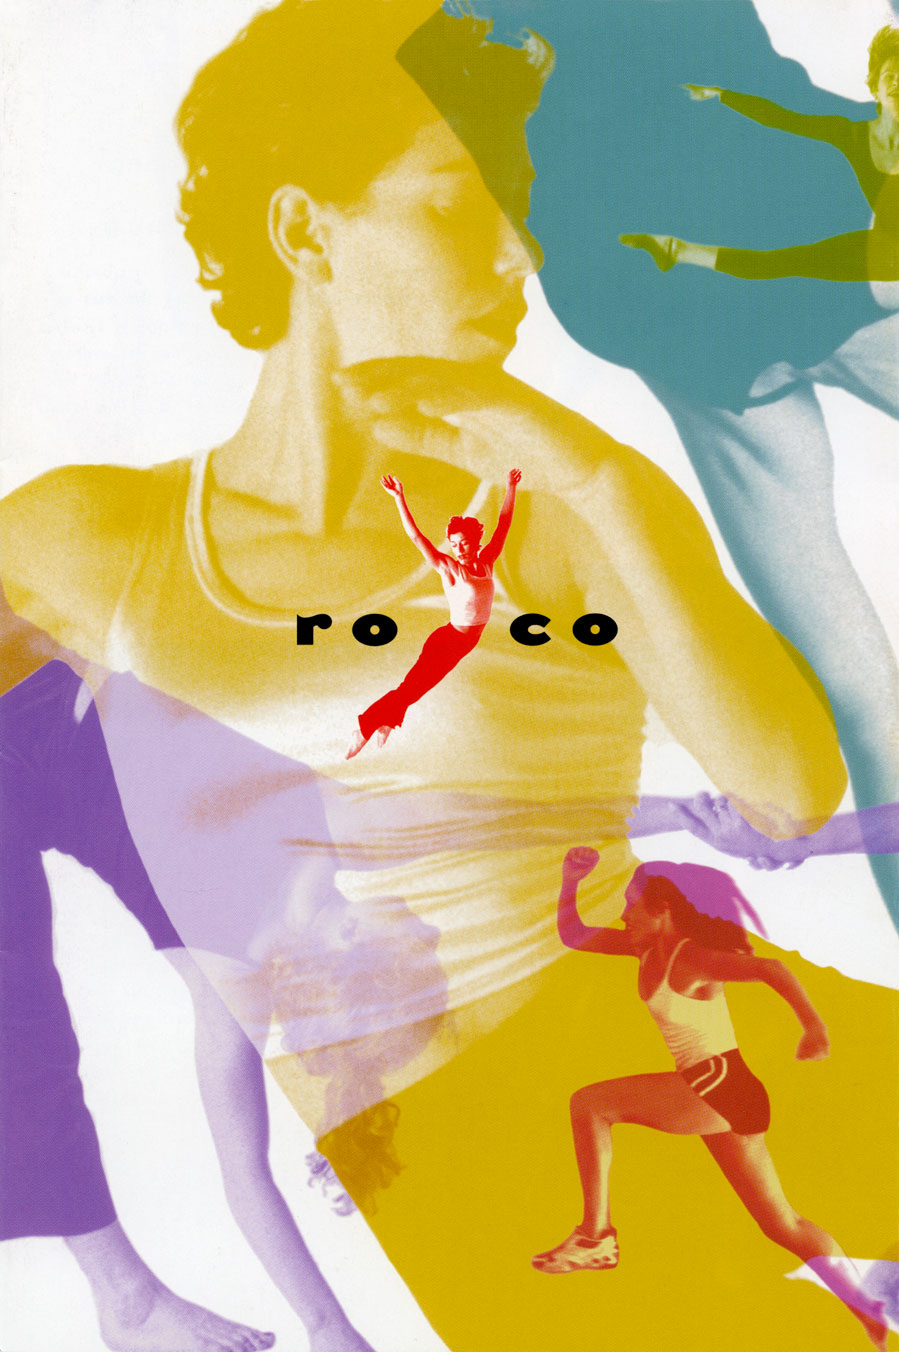 roco_cover_img650_smaller.jpg